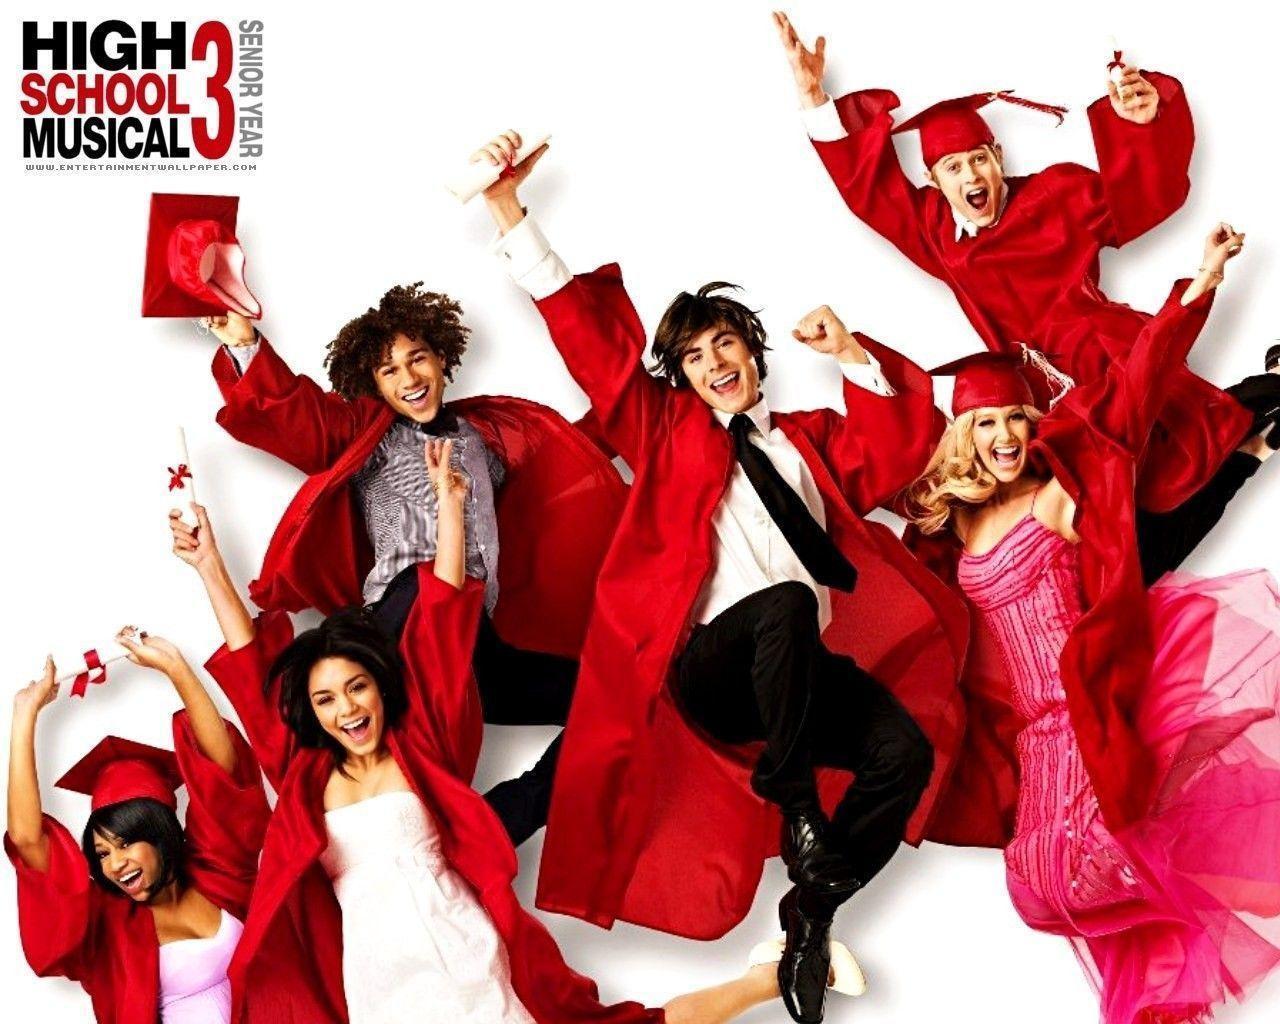 High School Musical Wallpapers - Wallpaper Cave mit High School Musical Senior Year Online